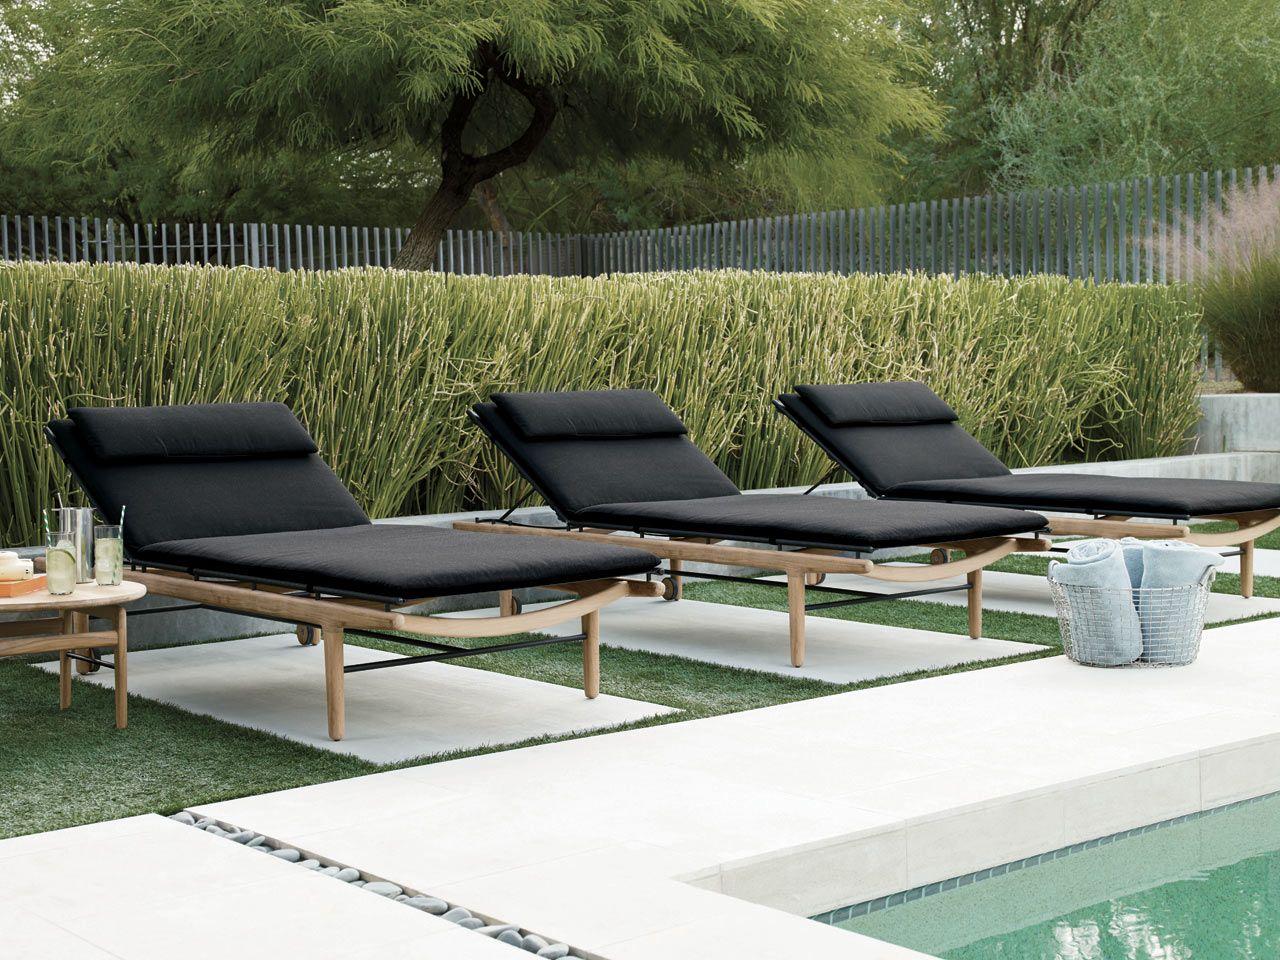 Pin On Design Deco Modern outdoor pool furniture